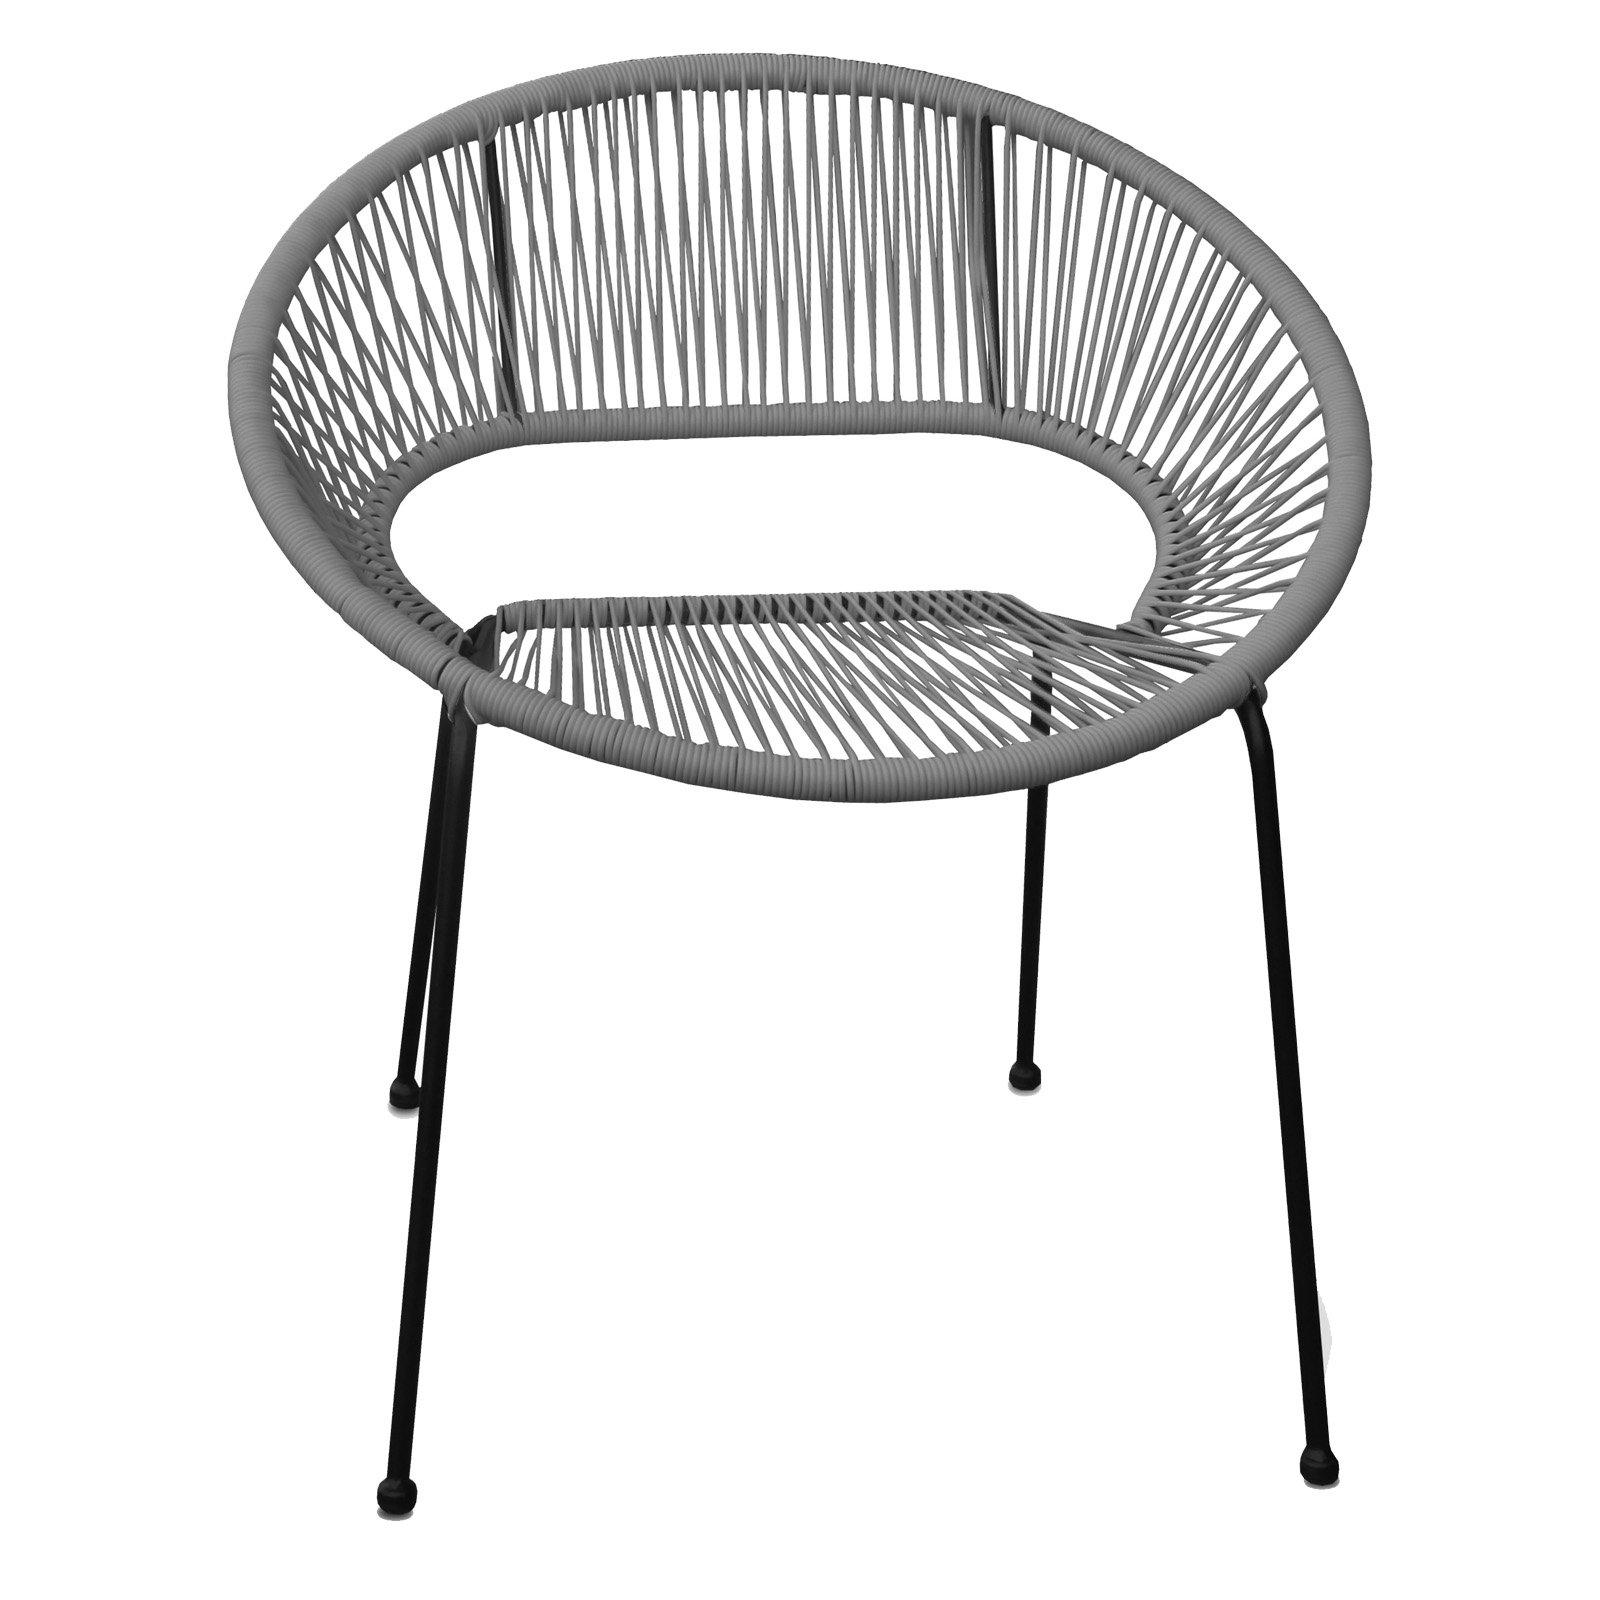 Harmonia Living Acapulco Patio Dining Chair Patio Dining Chairs Stylish Outdoor Furniture Backyard Furniture